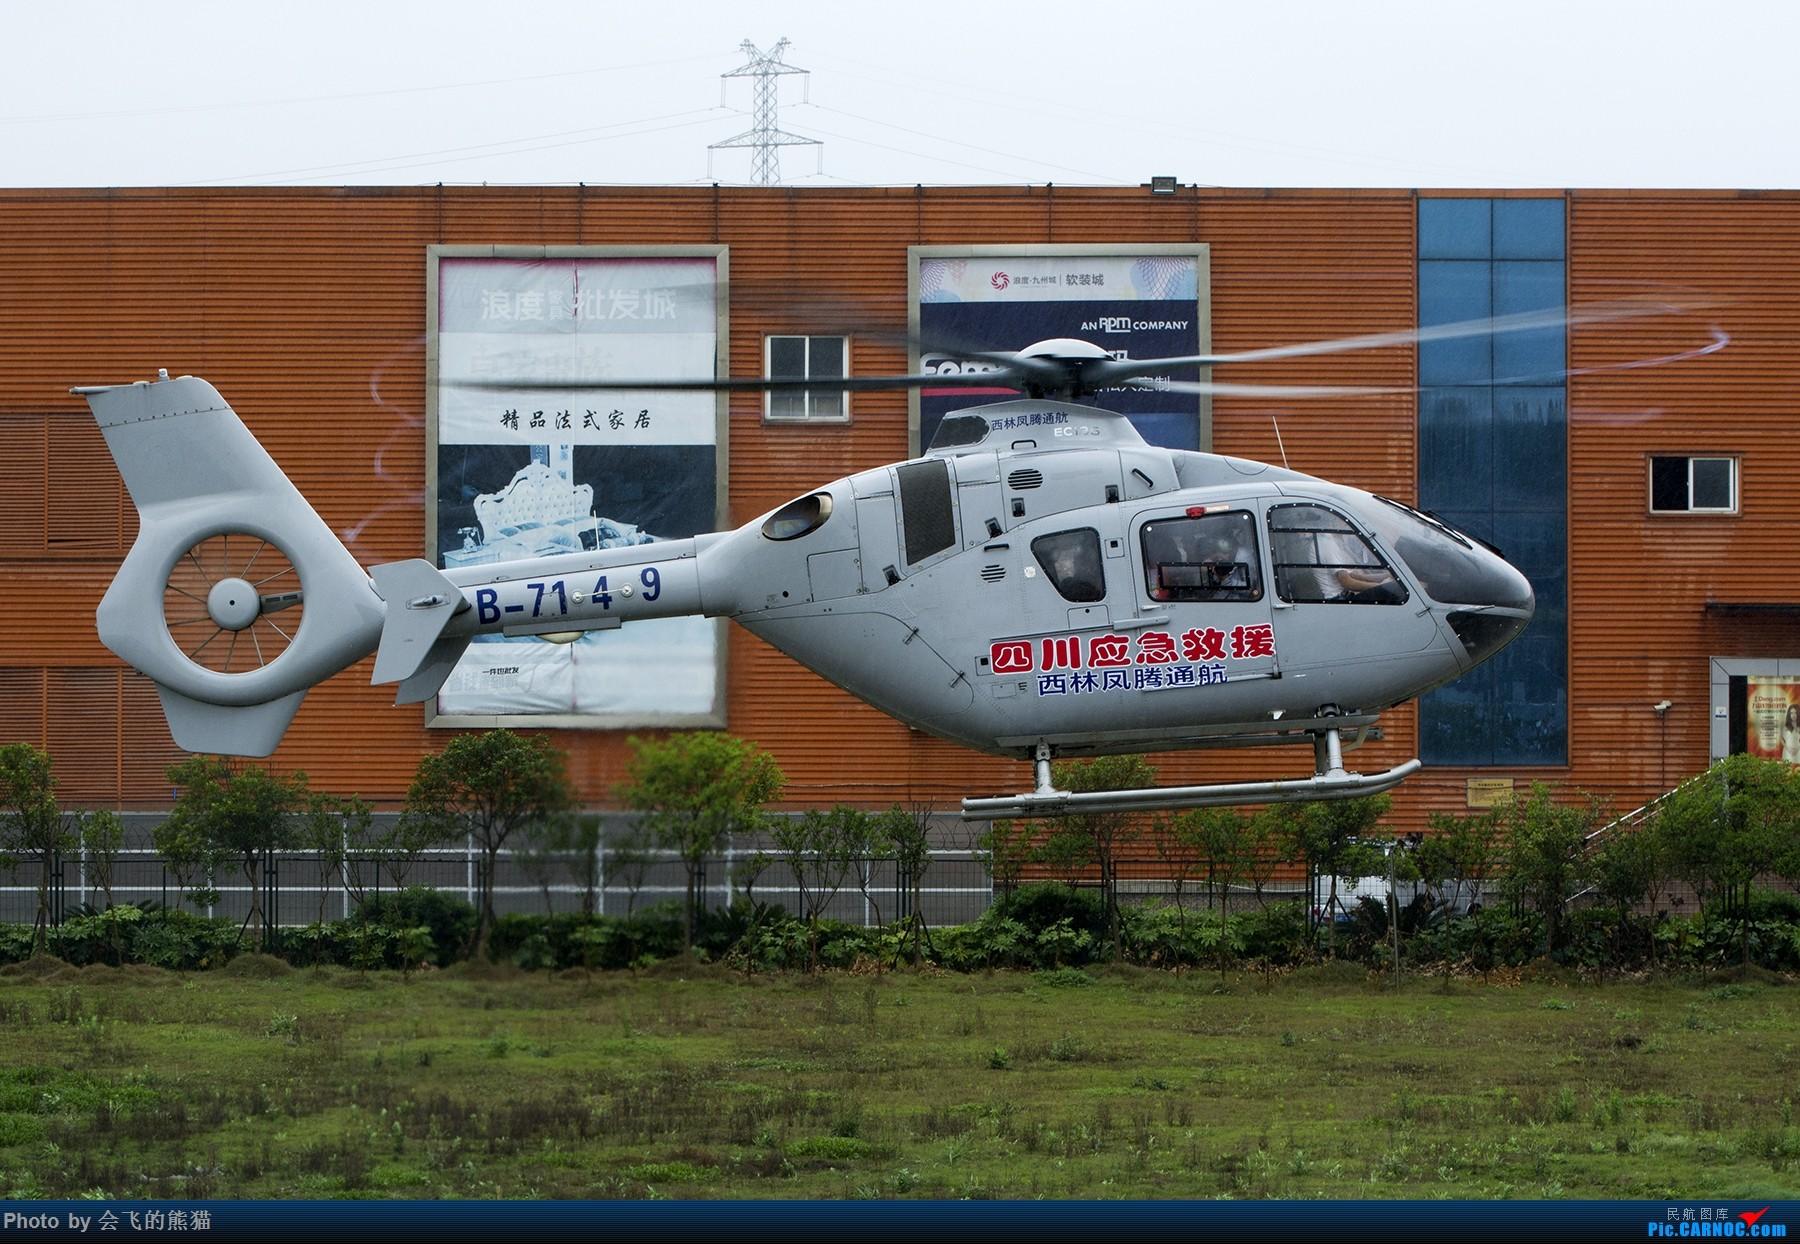 [原创]雨天 EUROCOPTER EC135T2 B-7149